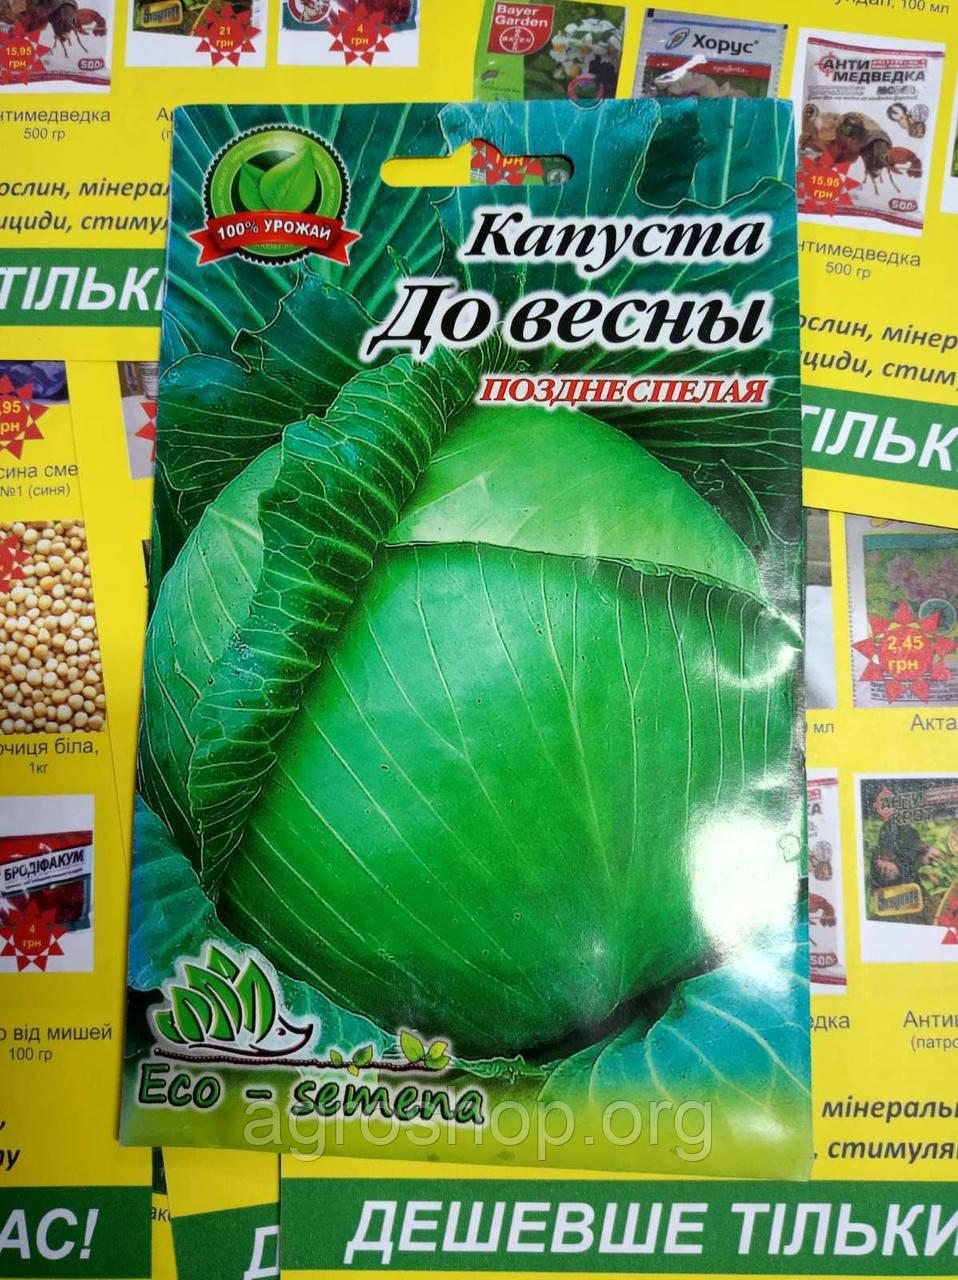 Семена Капуста До весны 5г